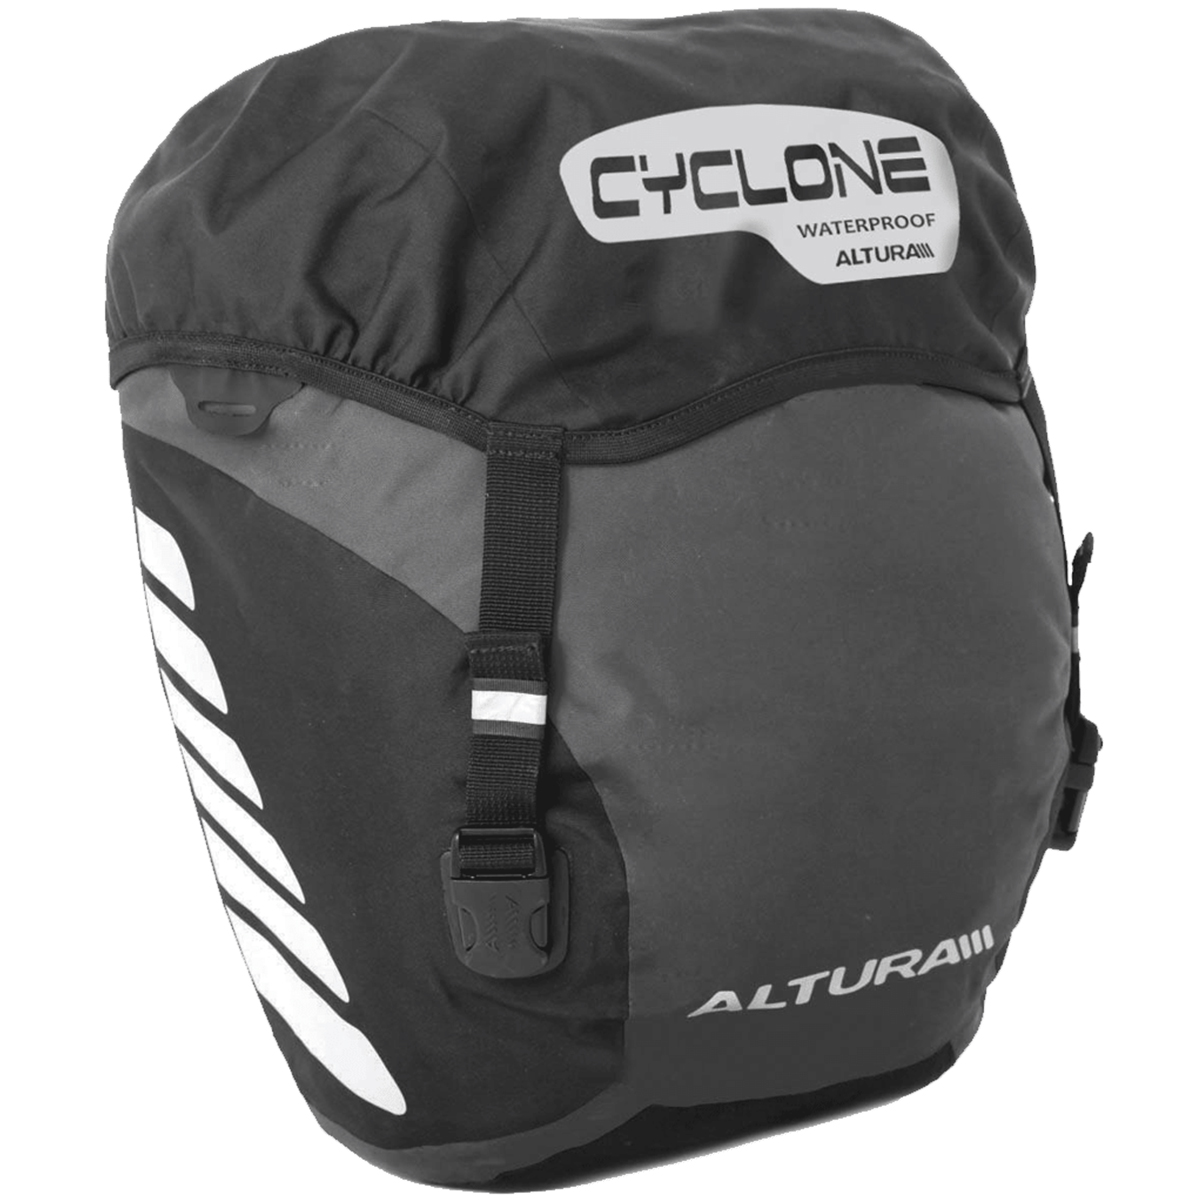 Altura Cyclone 20 Waterproof Pannier Bag